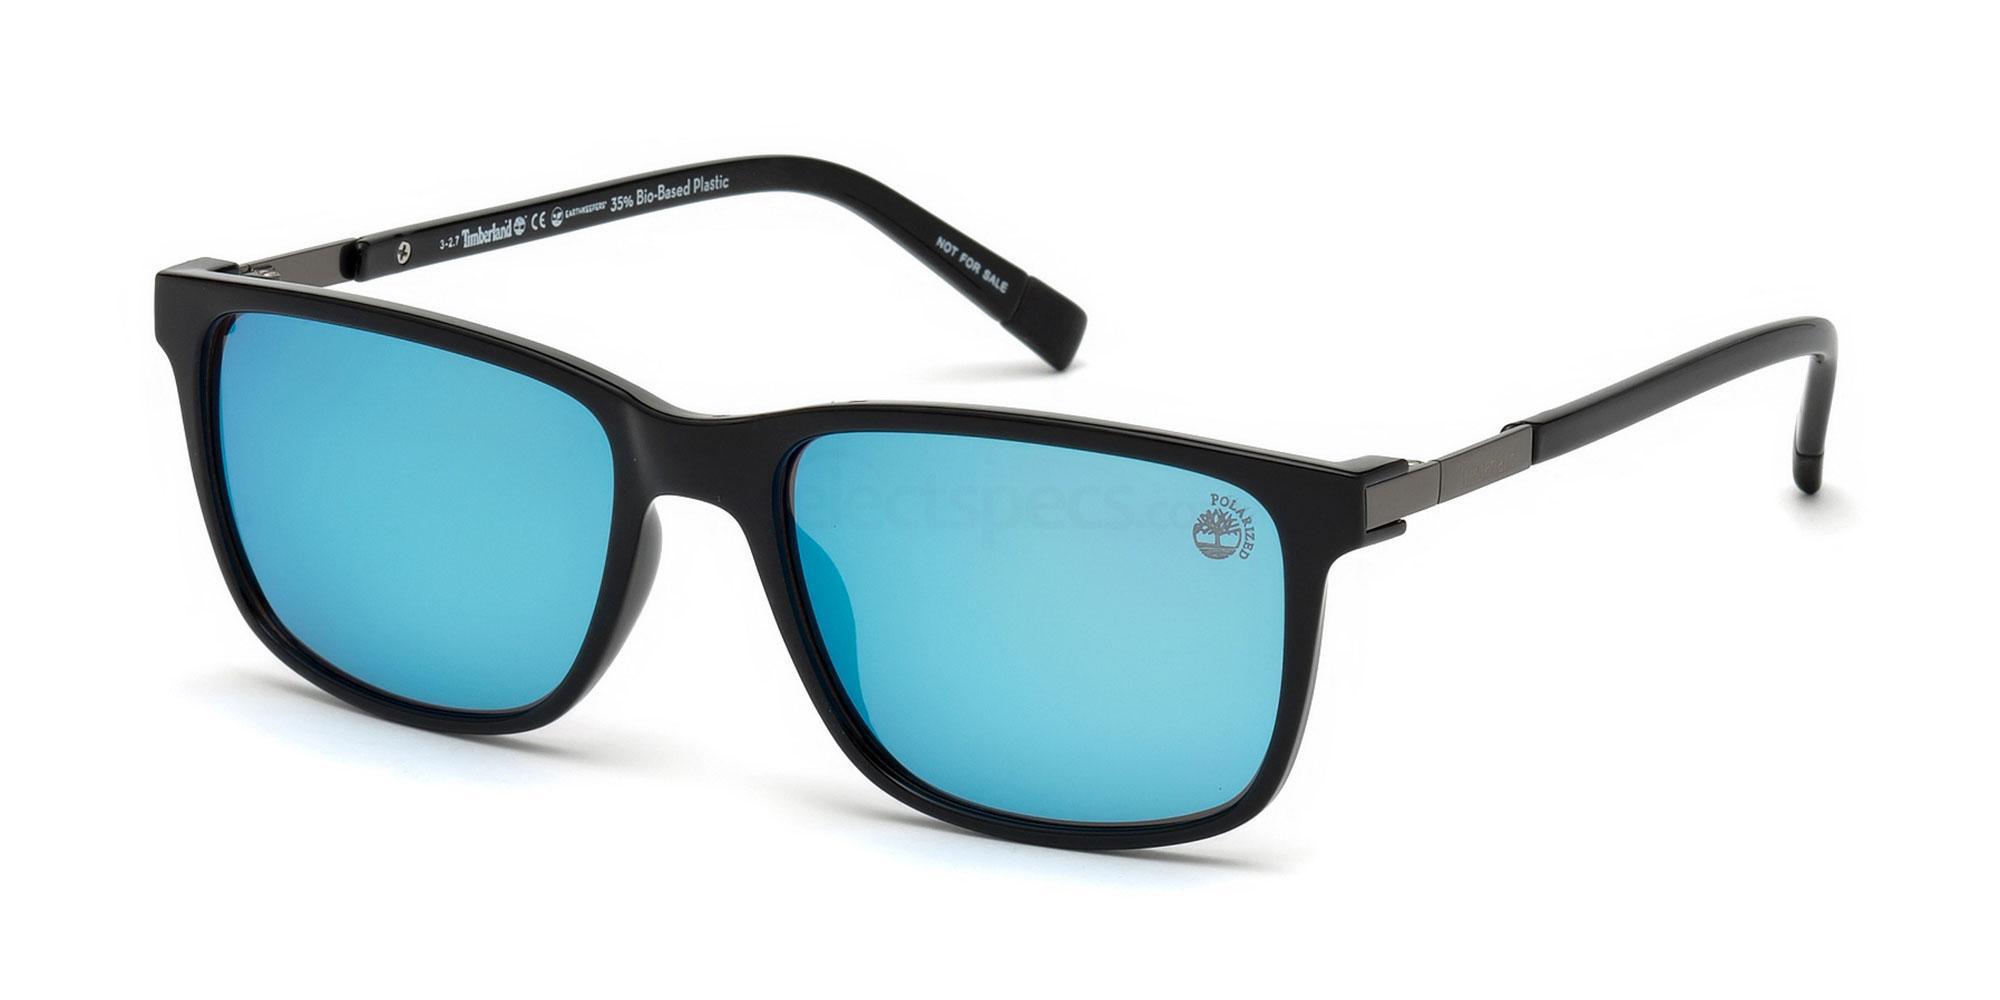 01H TB9152 Sunglasses, Timberland